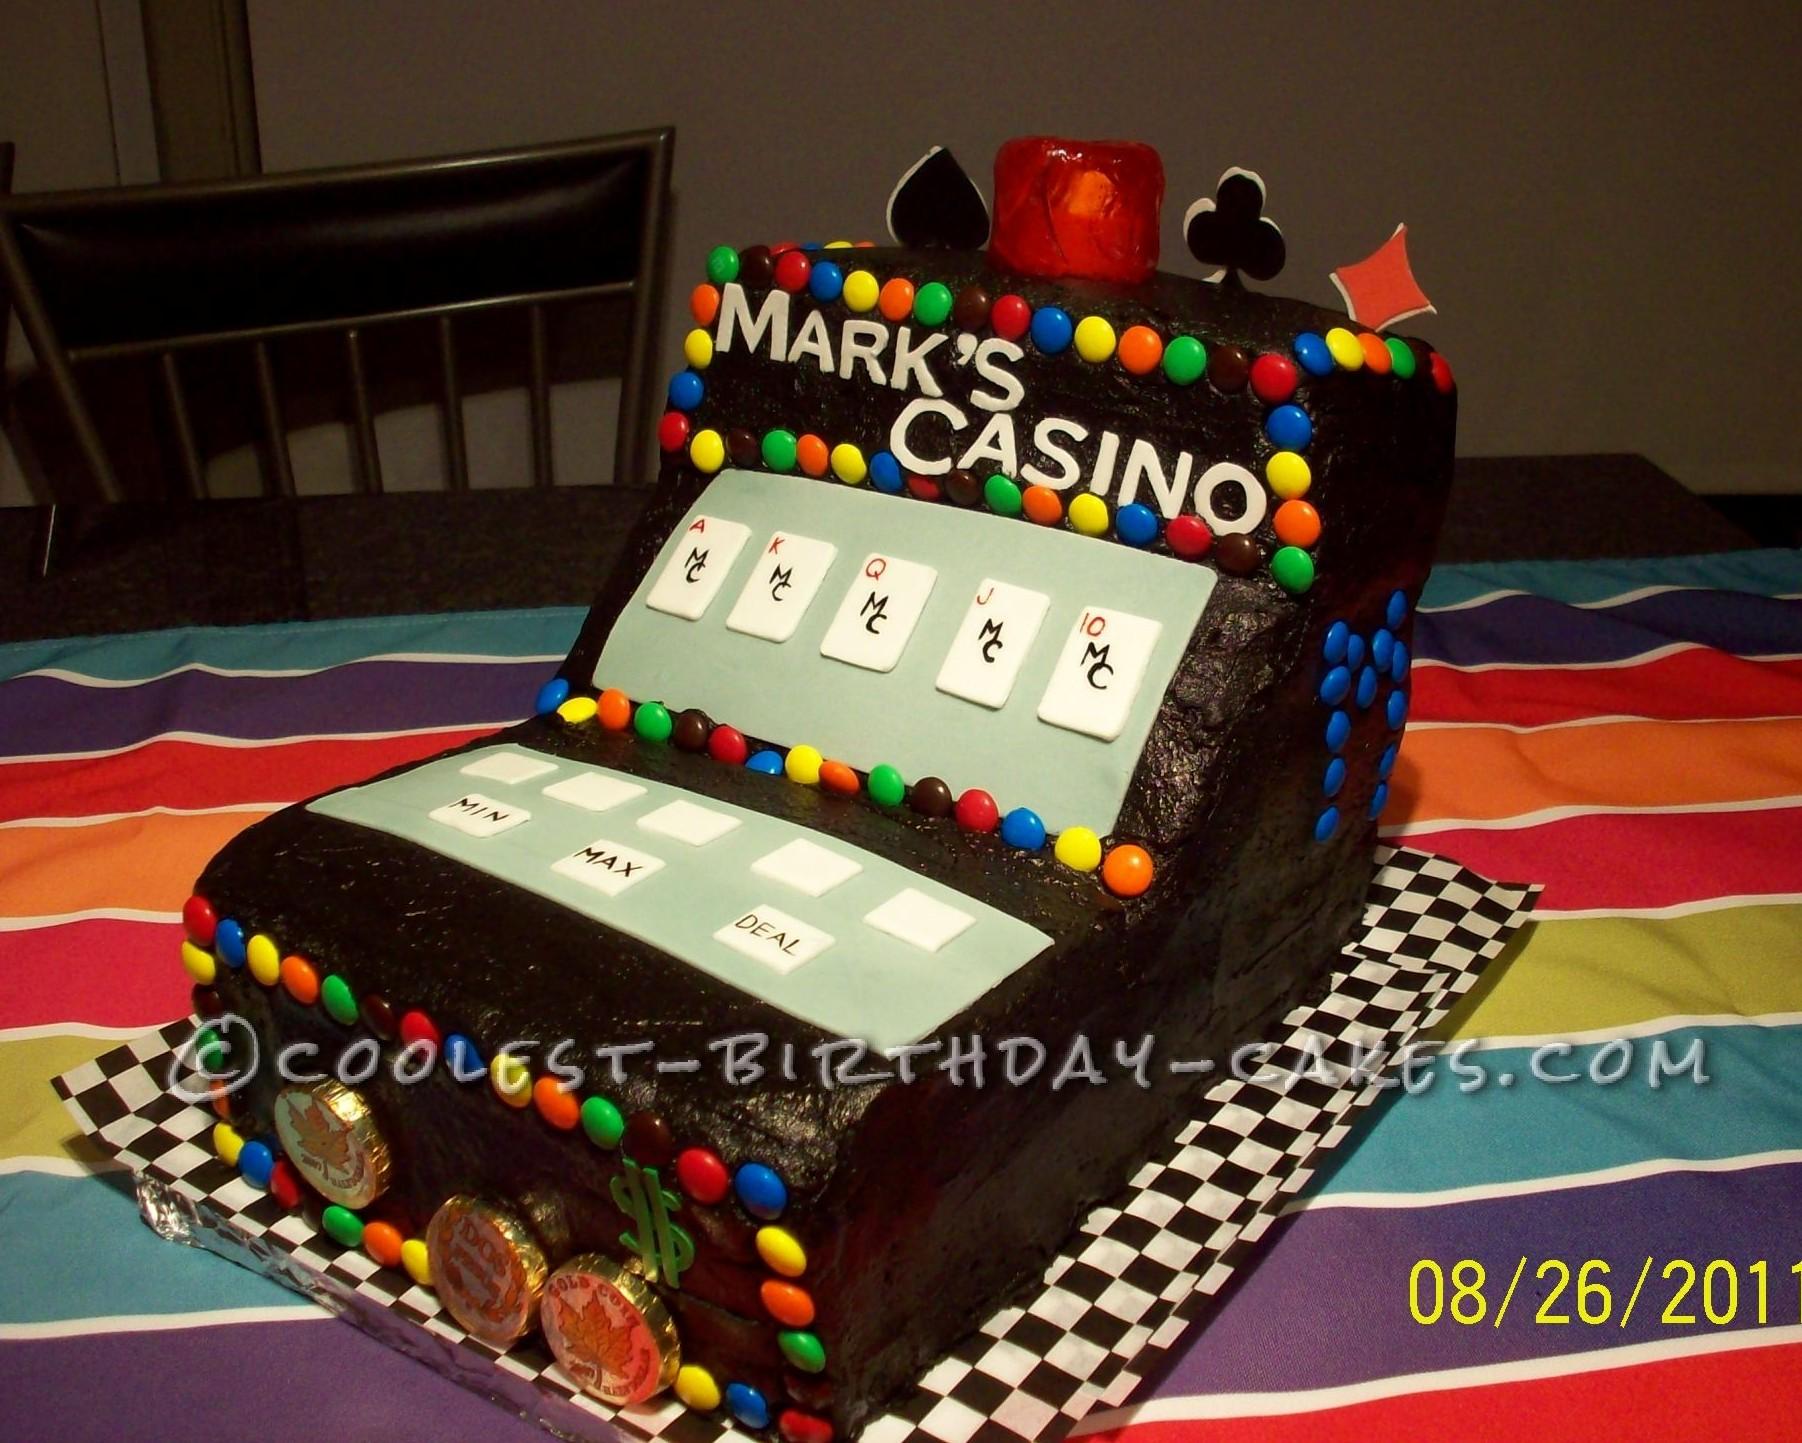 Coolest Casino Video Poker Cake